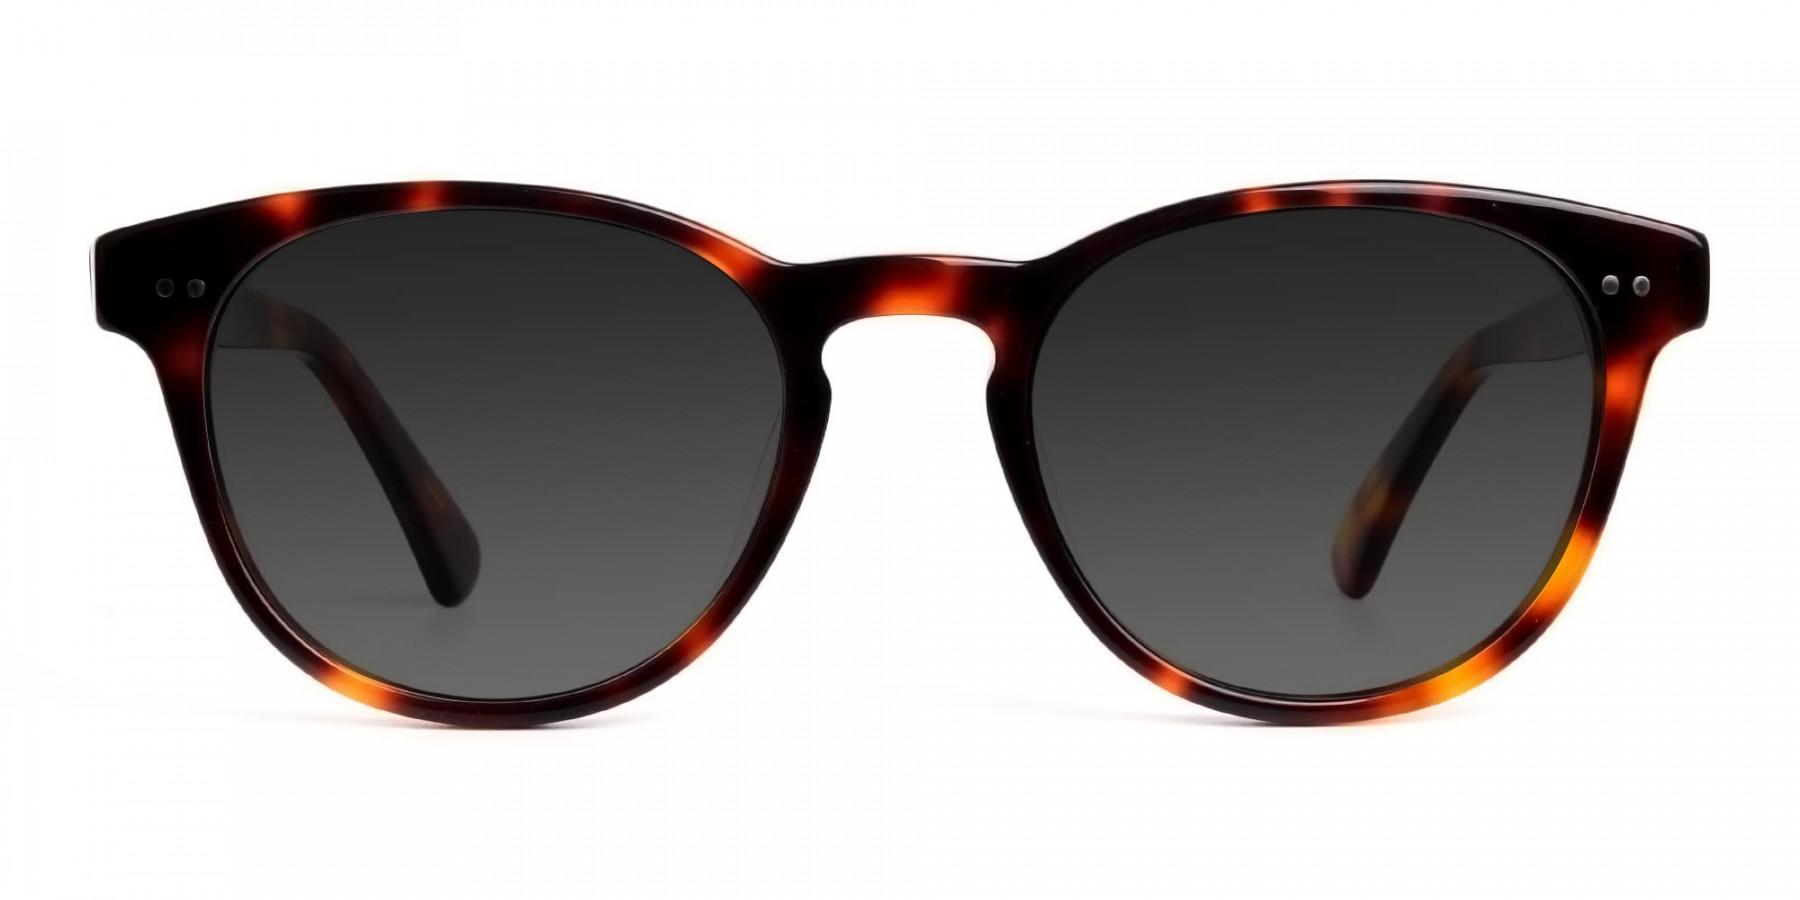 black-and-red-round-tortoiseshell-full-rim-dark-grey-tinted-sunglasses-frames-2